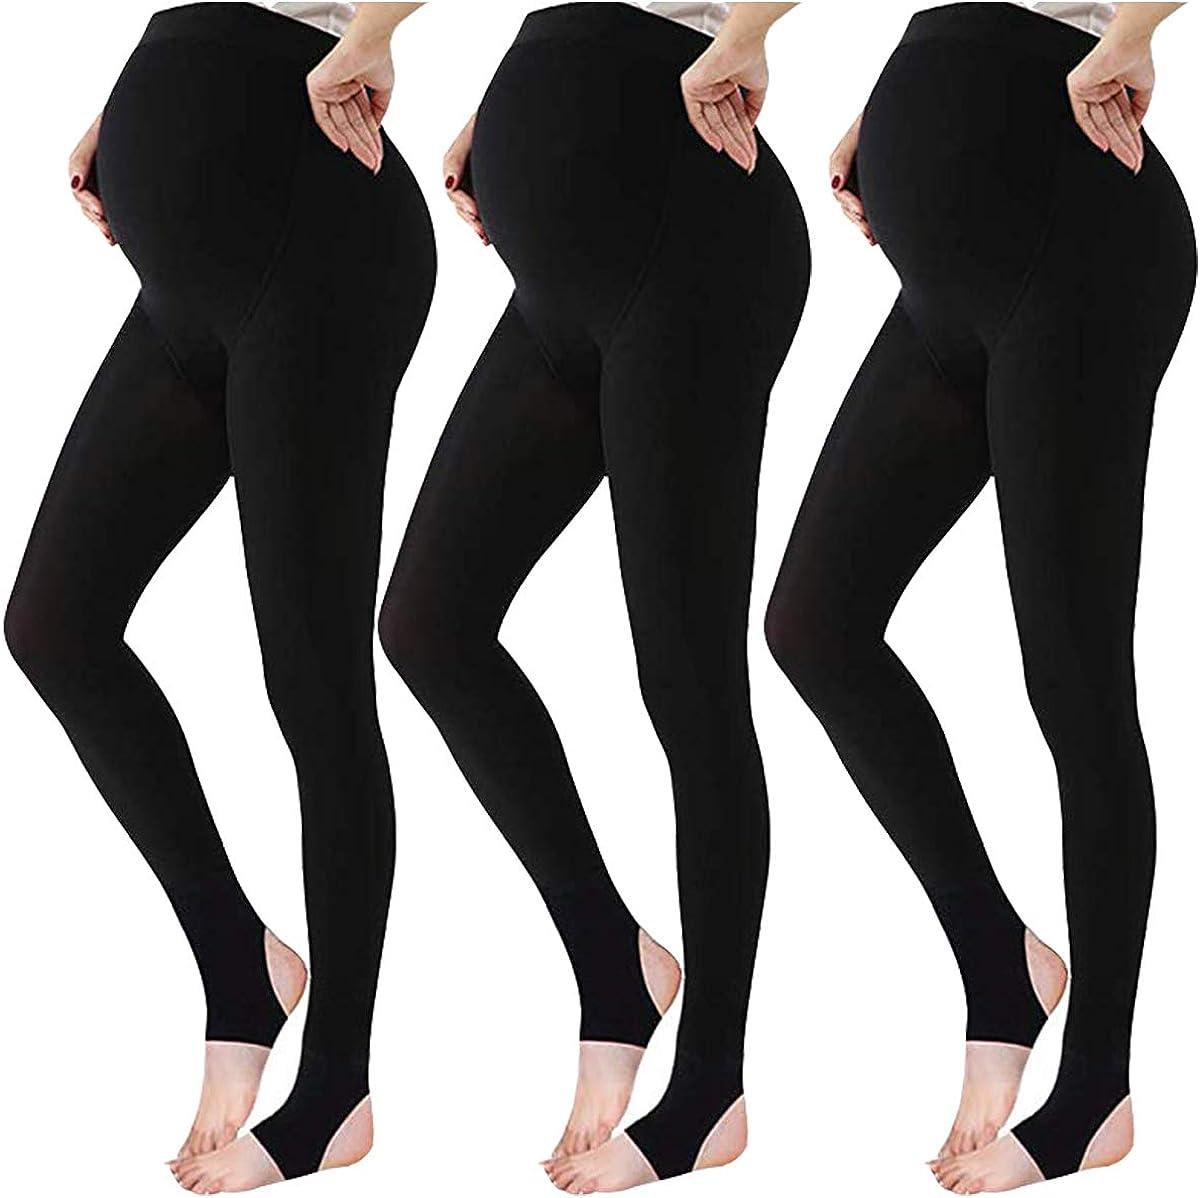 LOVELYBOBO 3 Pieces Collant maternity calze premaman opache Maternity Tights Maternit/à Leggings la gravidanza Donna 320D